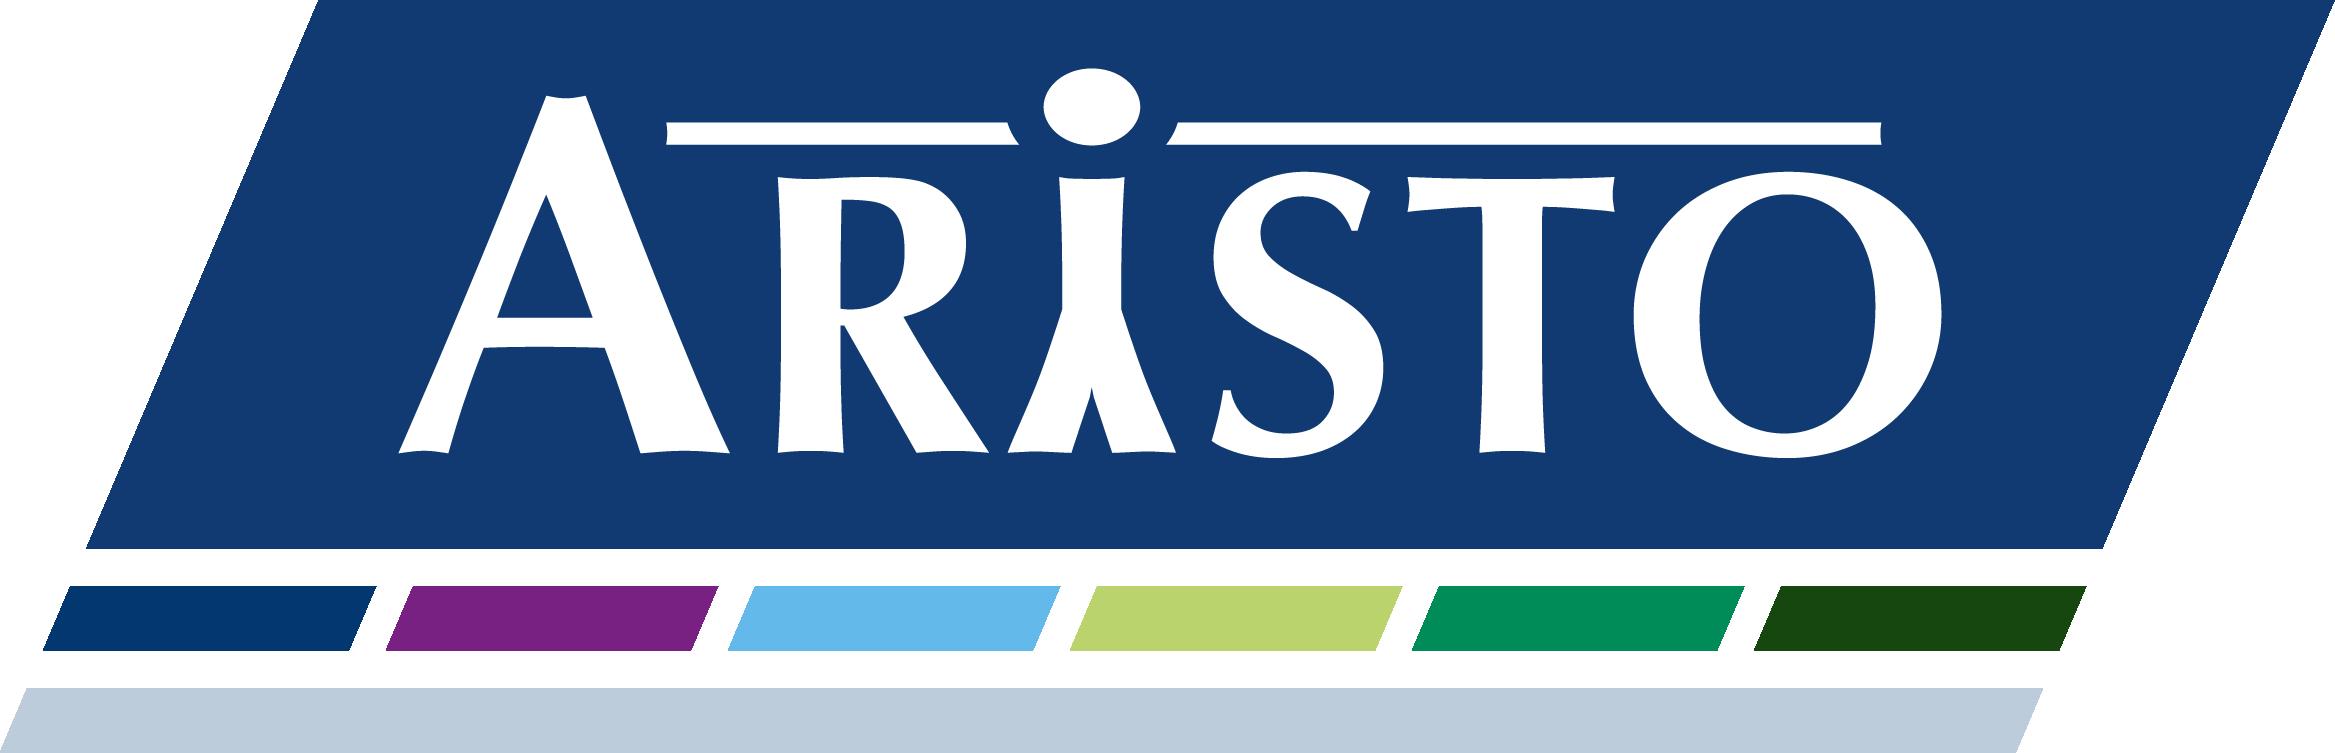 Aristo (esparma)